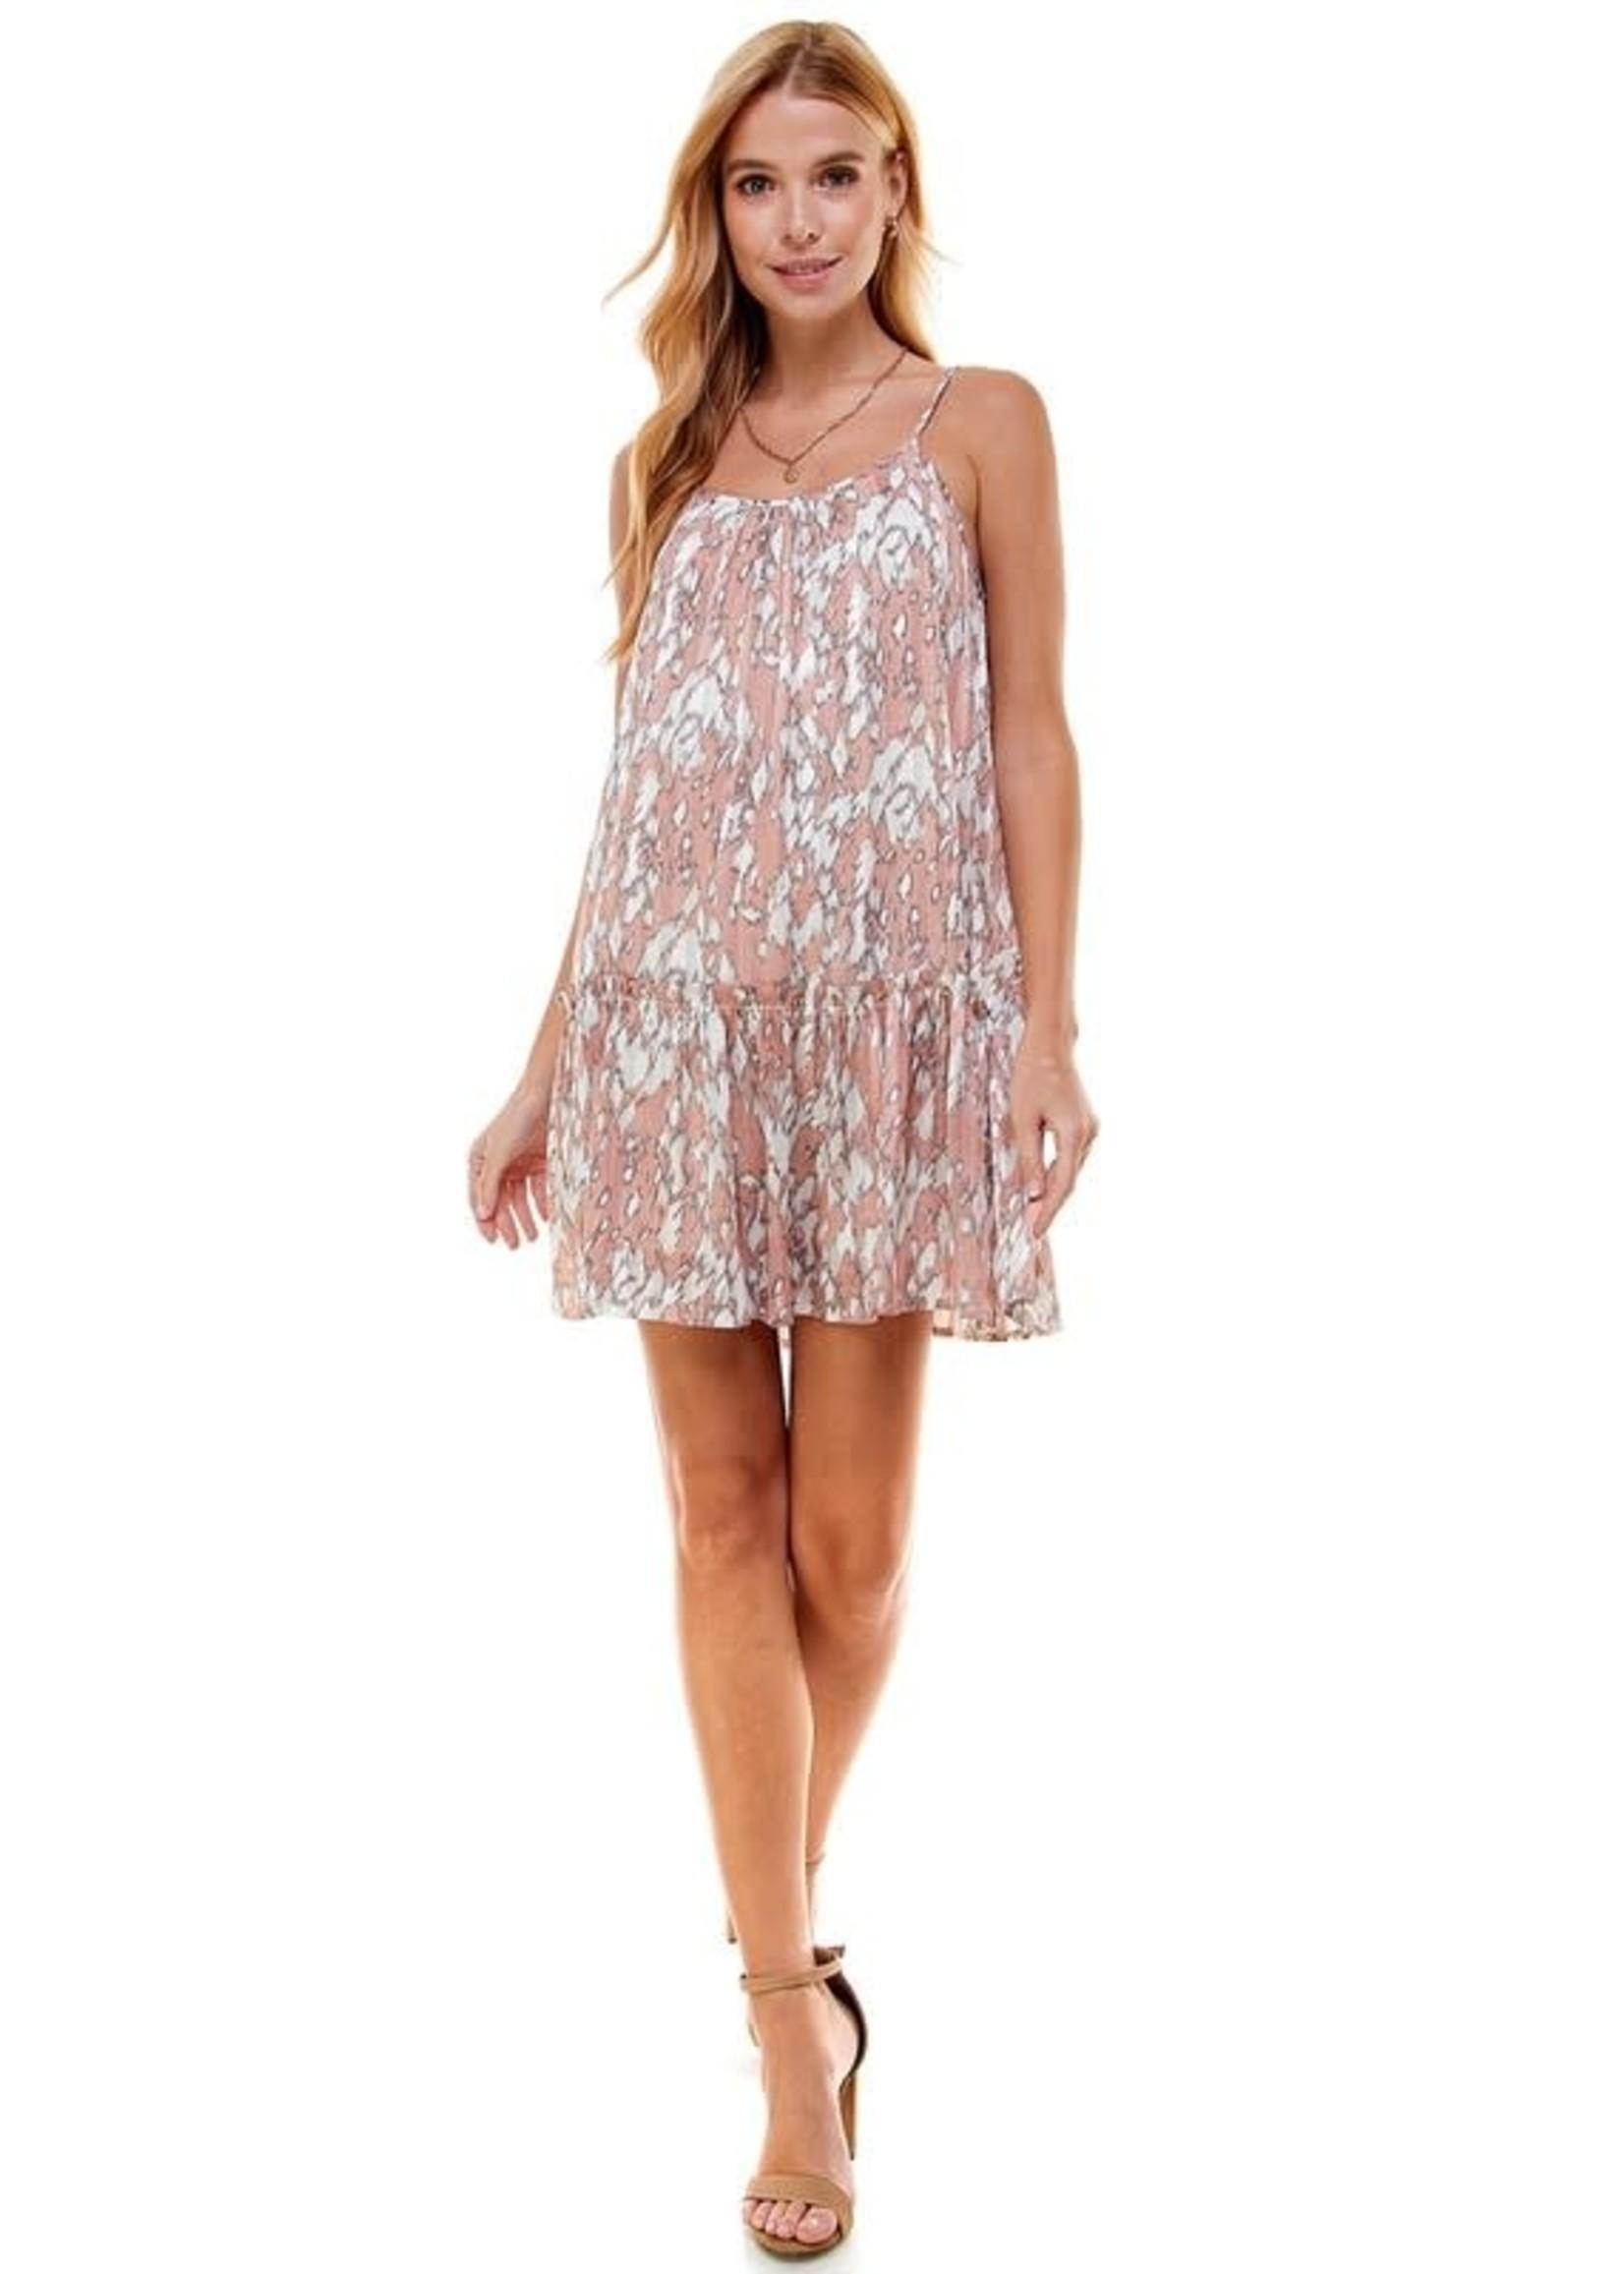 Pretty Follies Patterned Flowy Mini Dress - CD02170